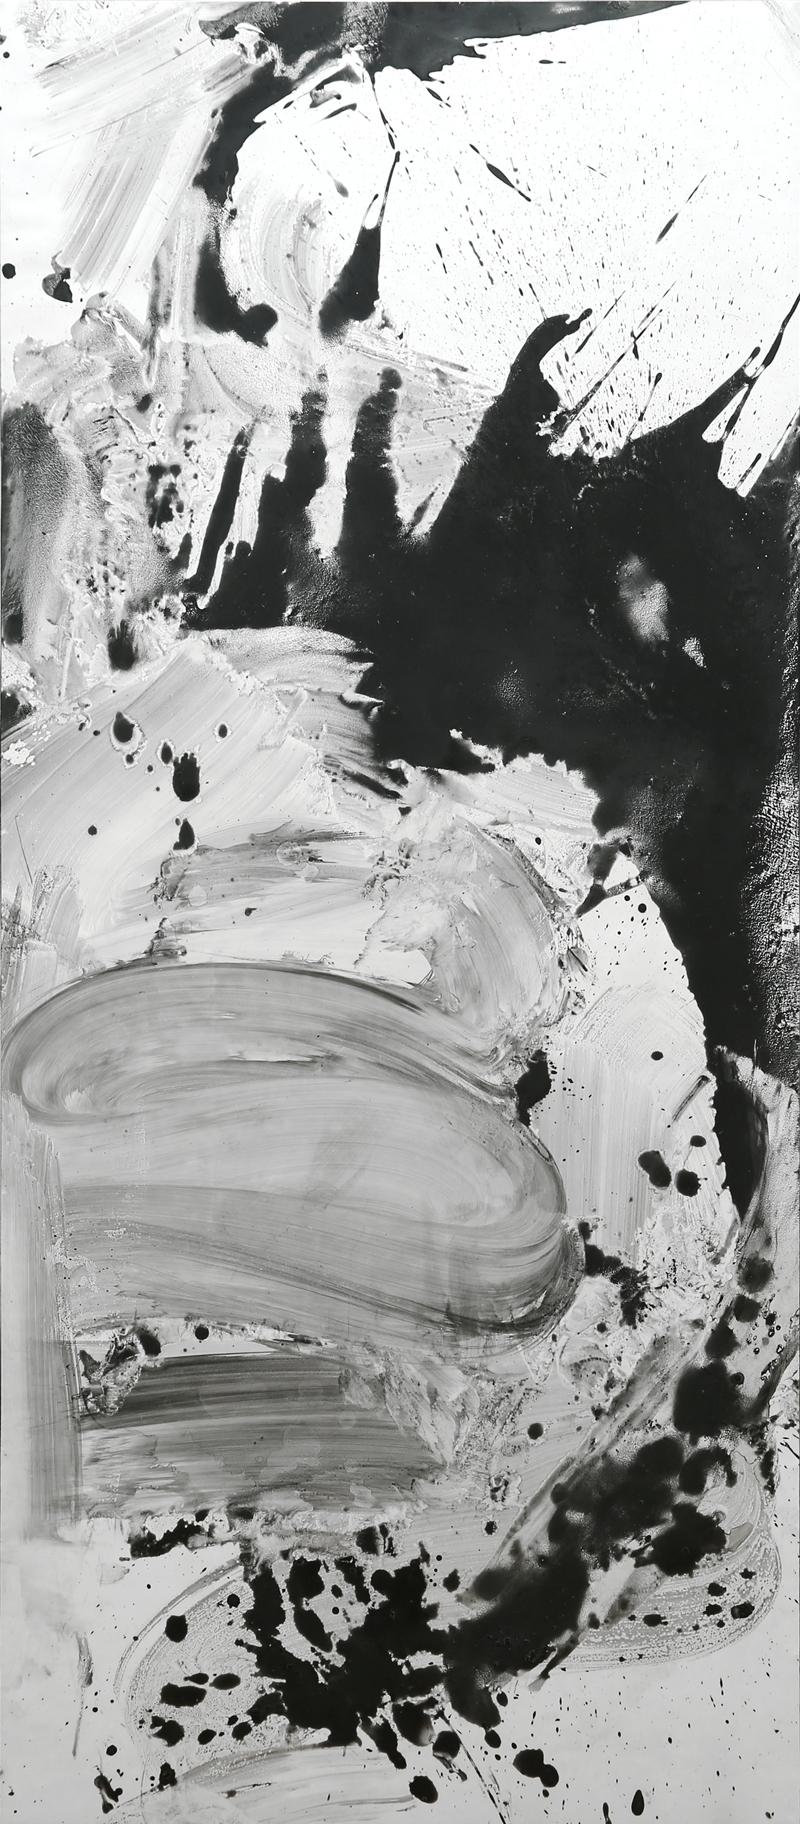 Untitled 01, 2013